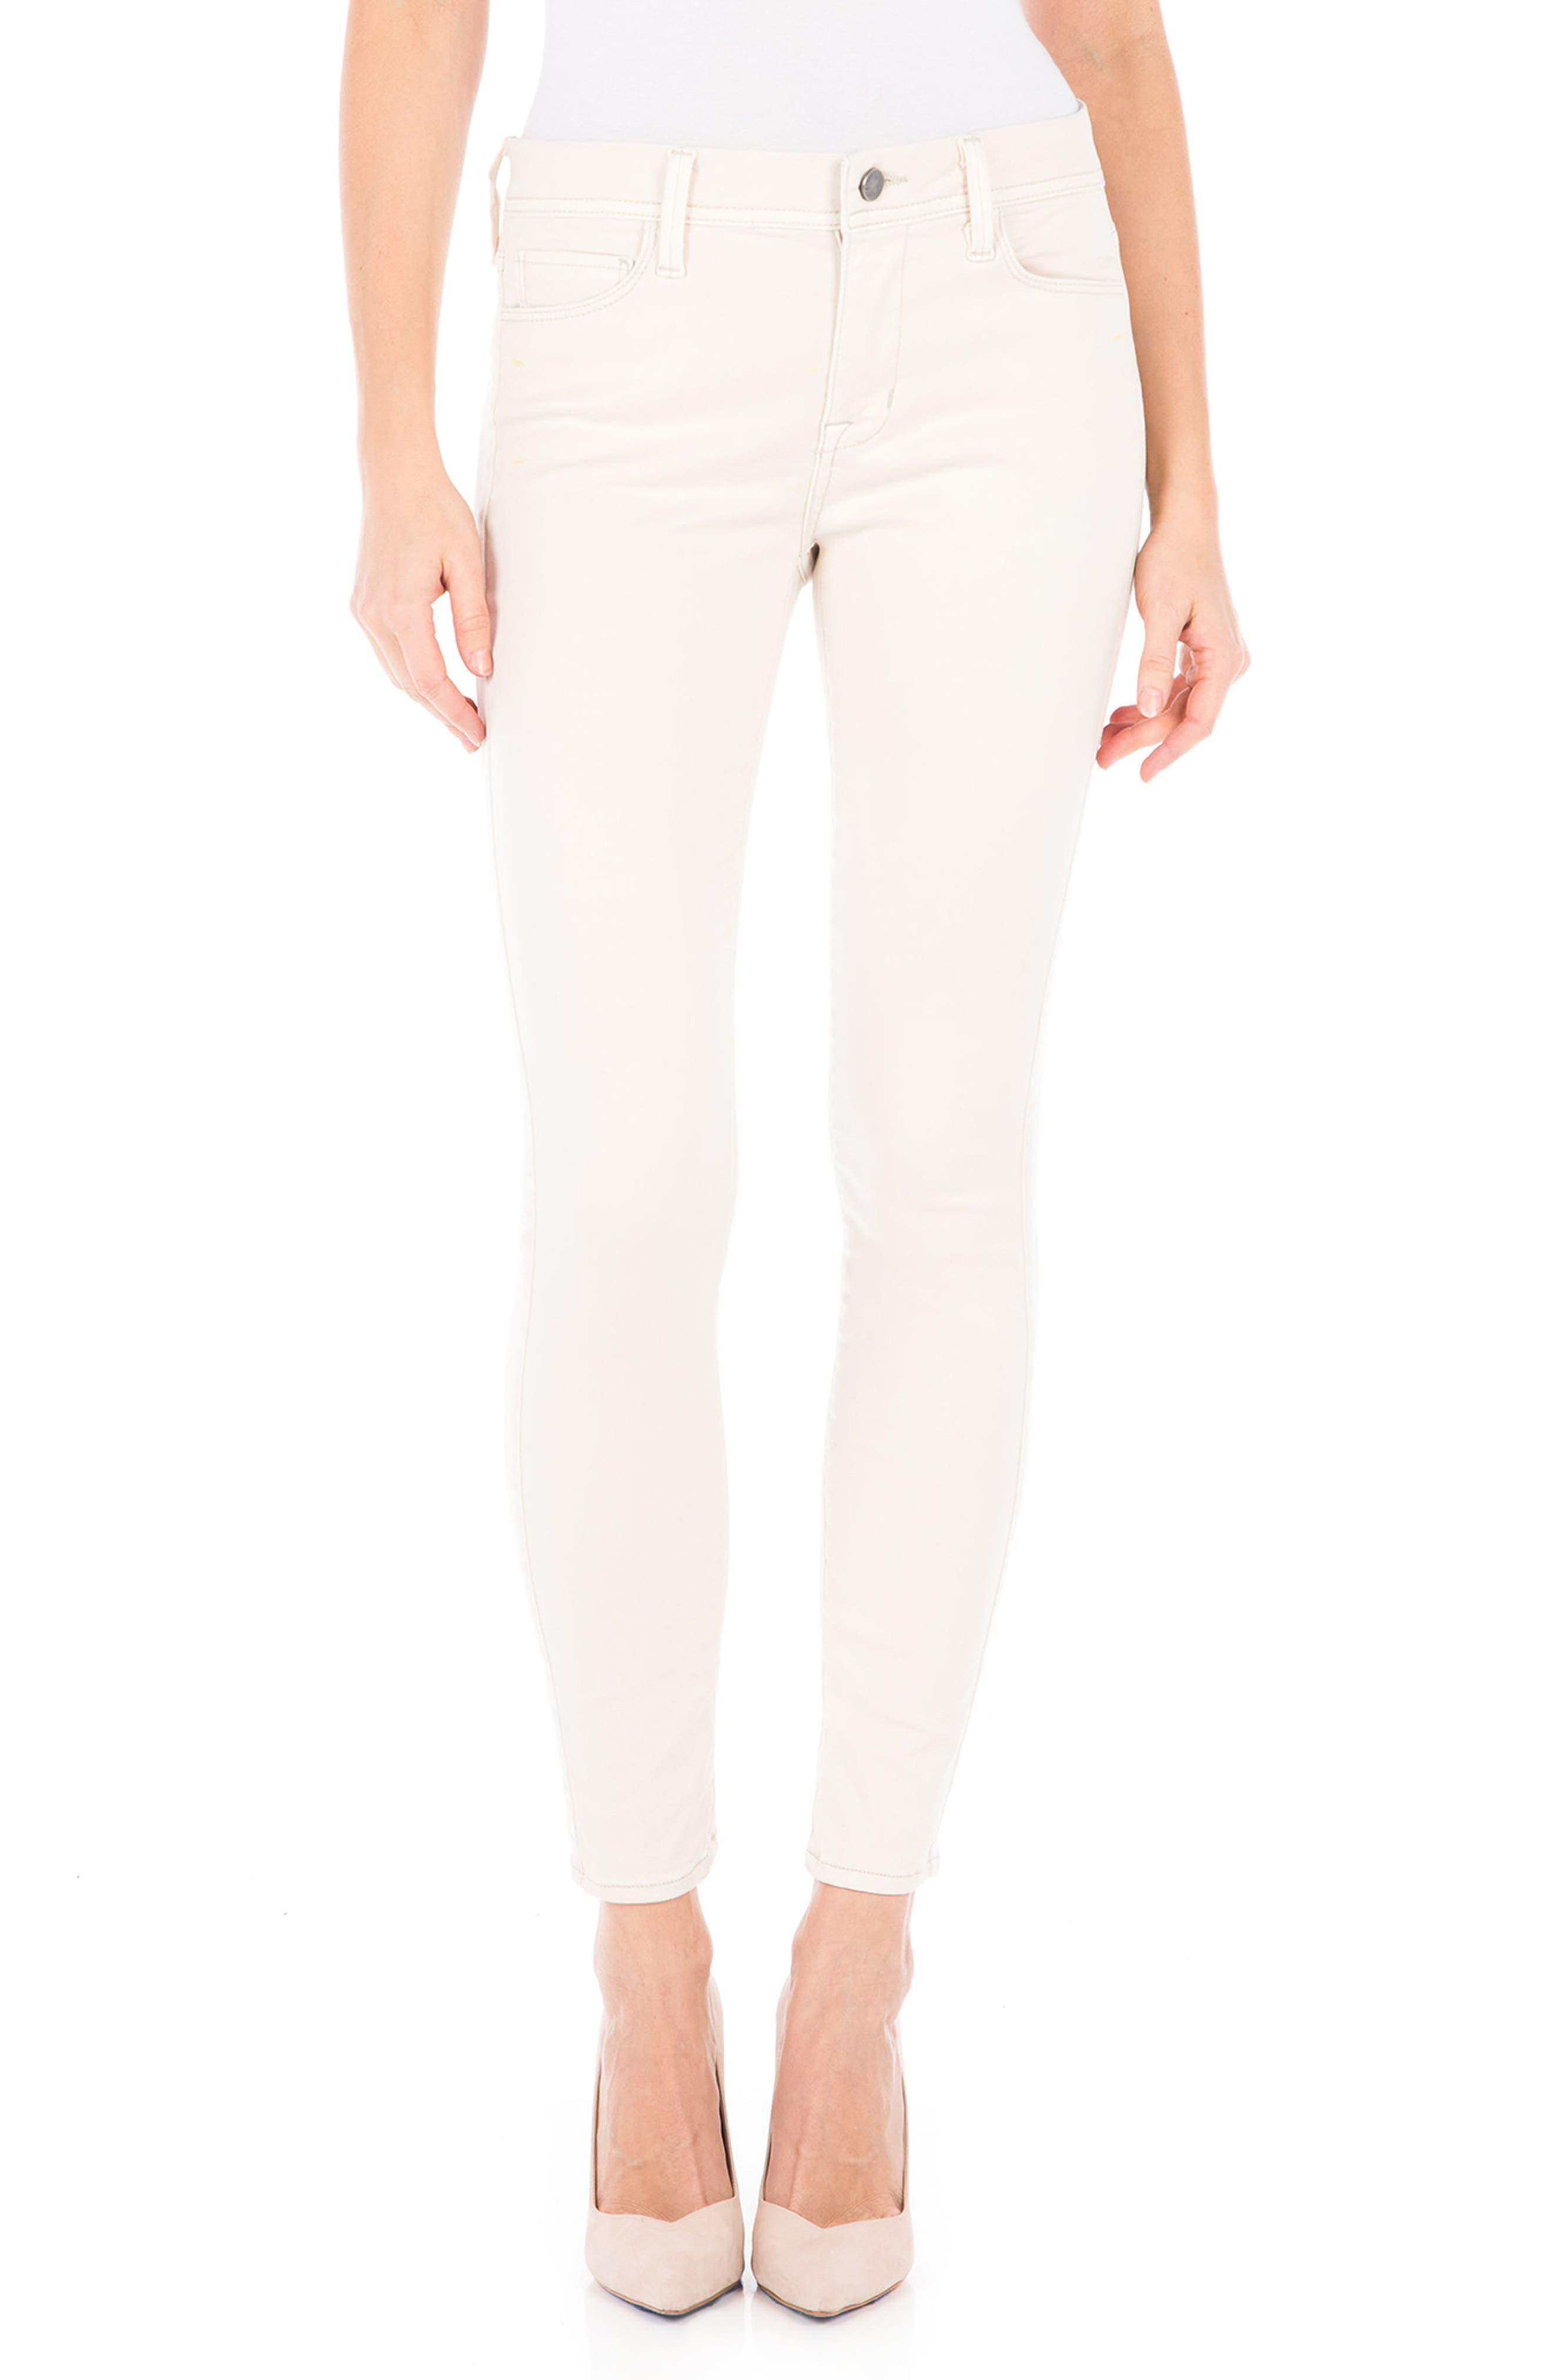 Sola Skinny Jeans,                             Main thumbnail 1, color,                             100